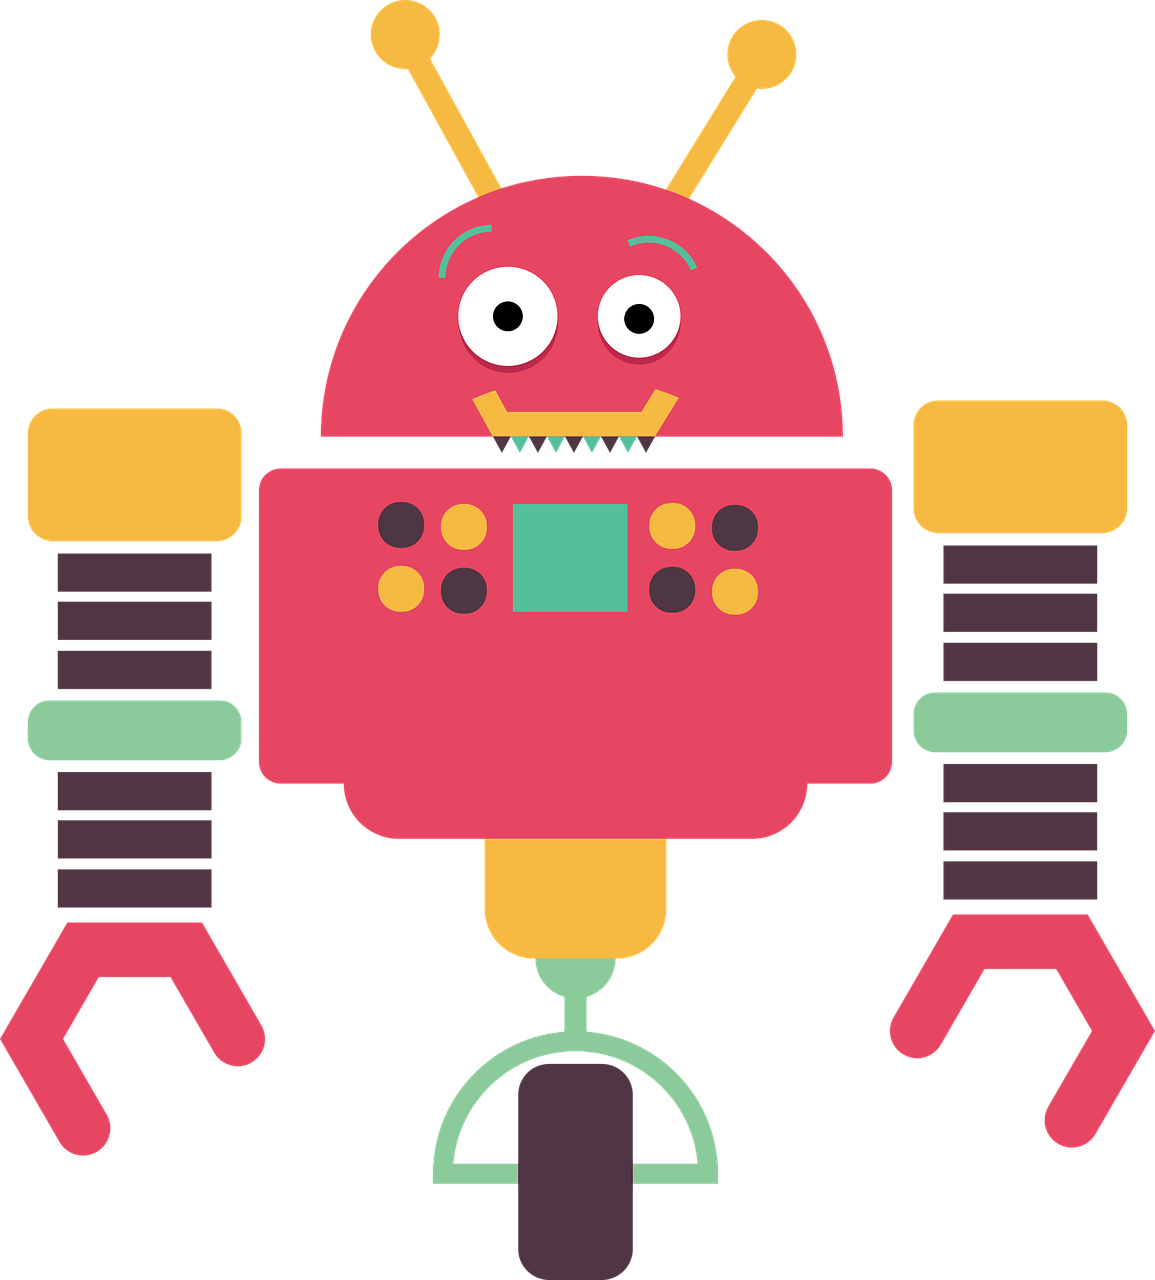 robot, robotics, technology